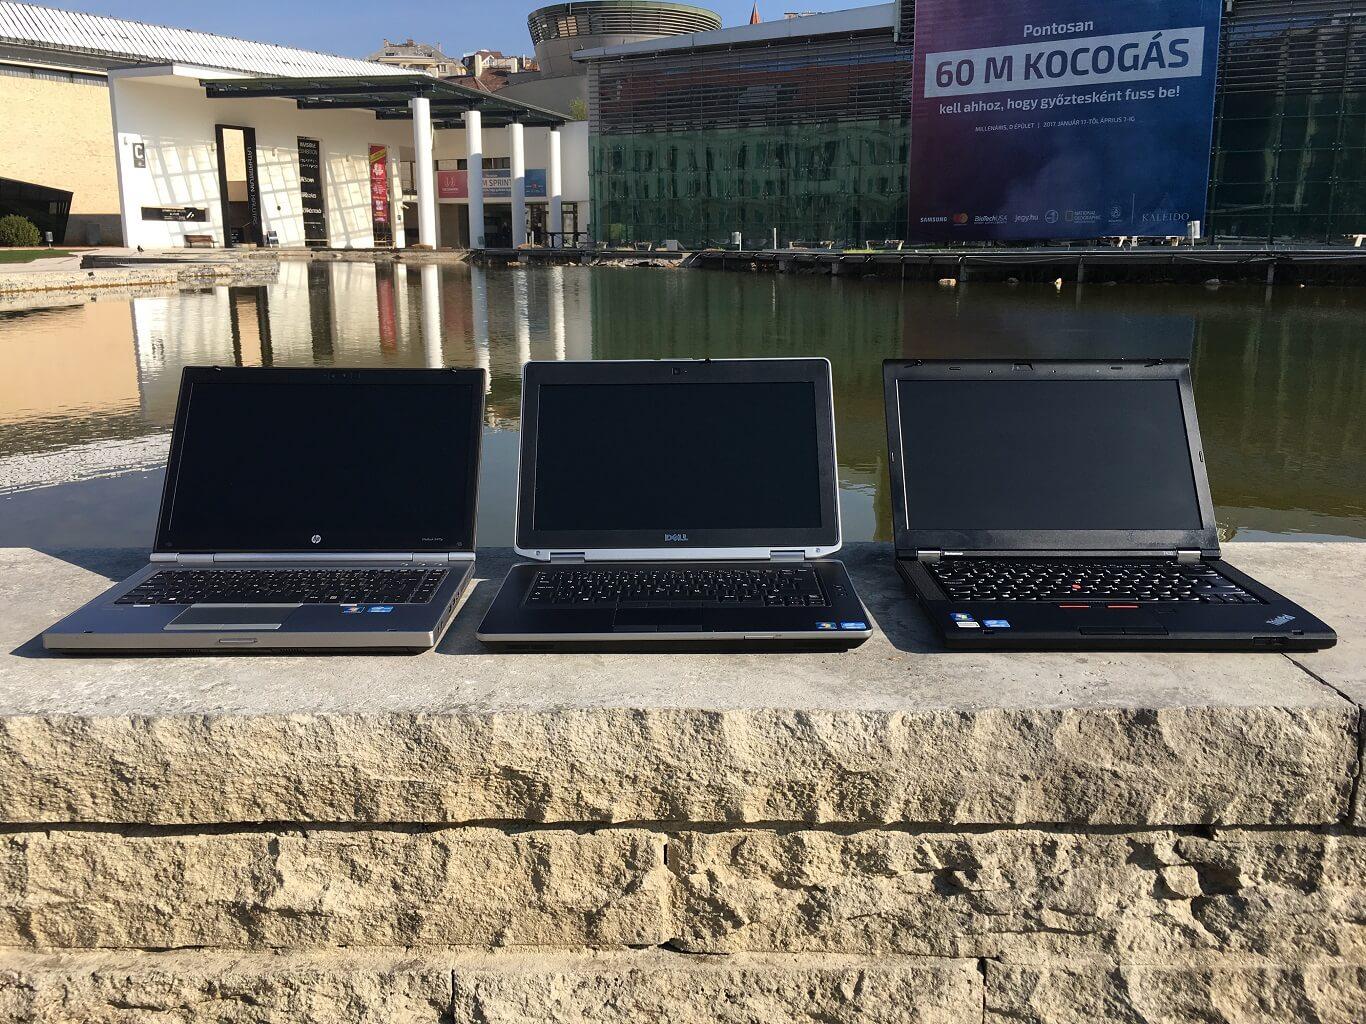 HP EliteBook 8470p vs Dell Latitude E6430 vs Lenovo ThinkPad T430 teszt 5a3301e893